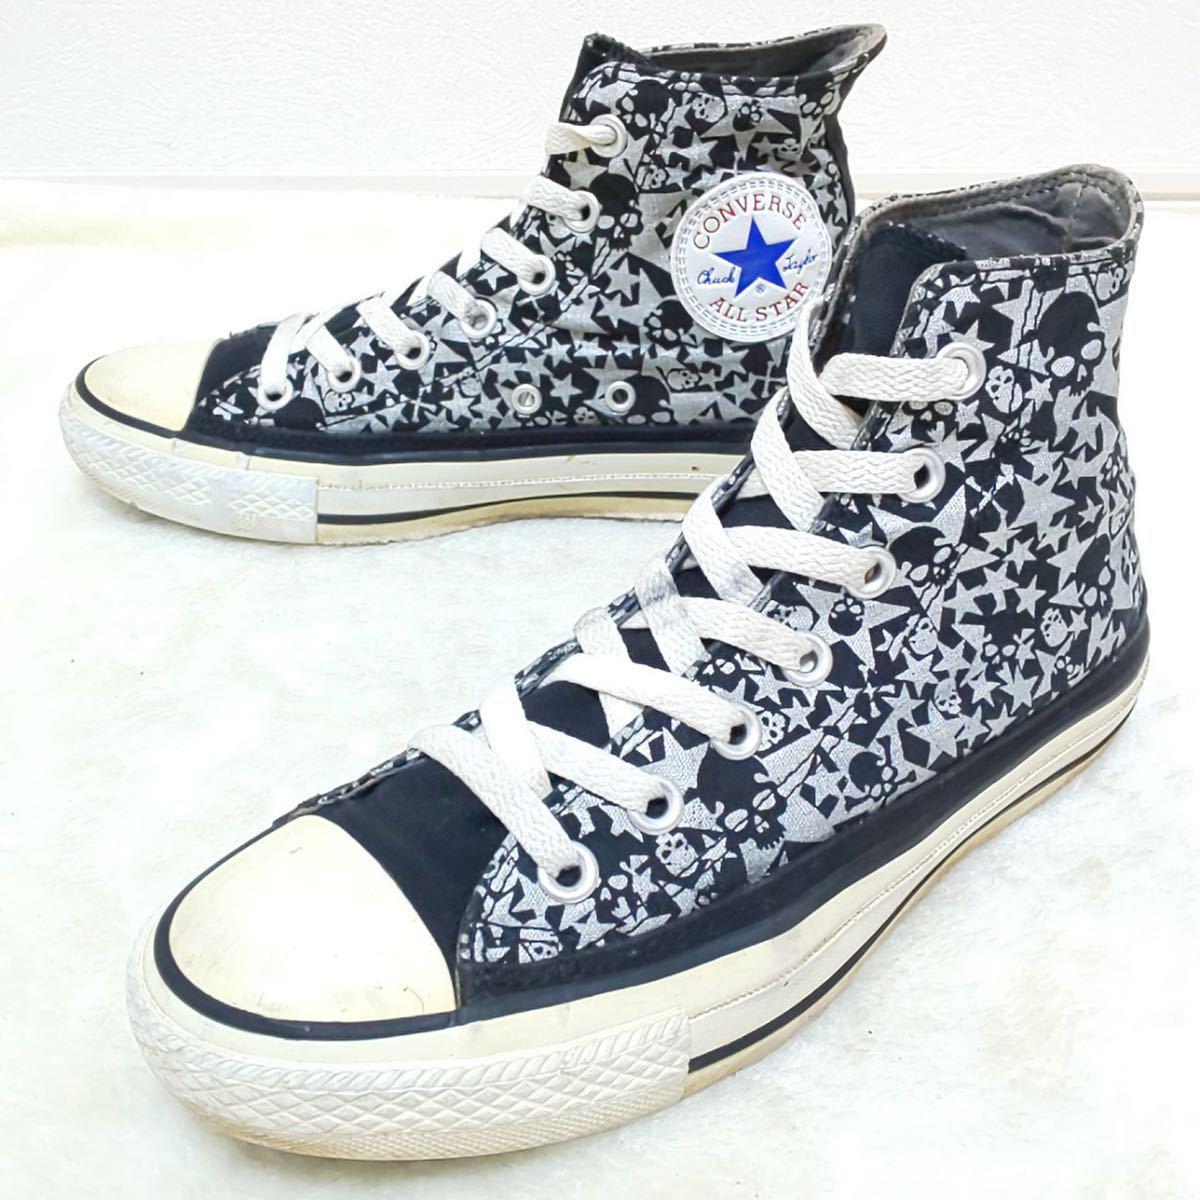 【CONVERSE】コンバースオールスター ALL STAR ハイカットスニーカー キャンバス ドクロ スカル ロック 黒 シルバー 靴 シューズ 24cm/jx_画像1